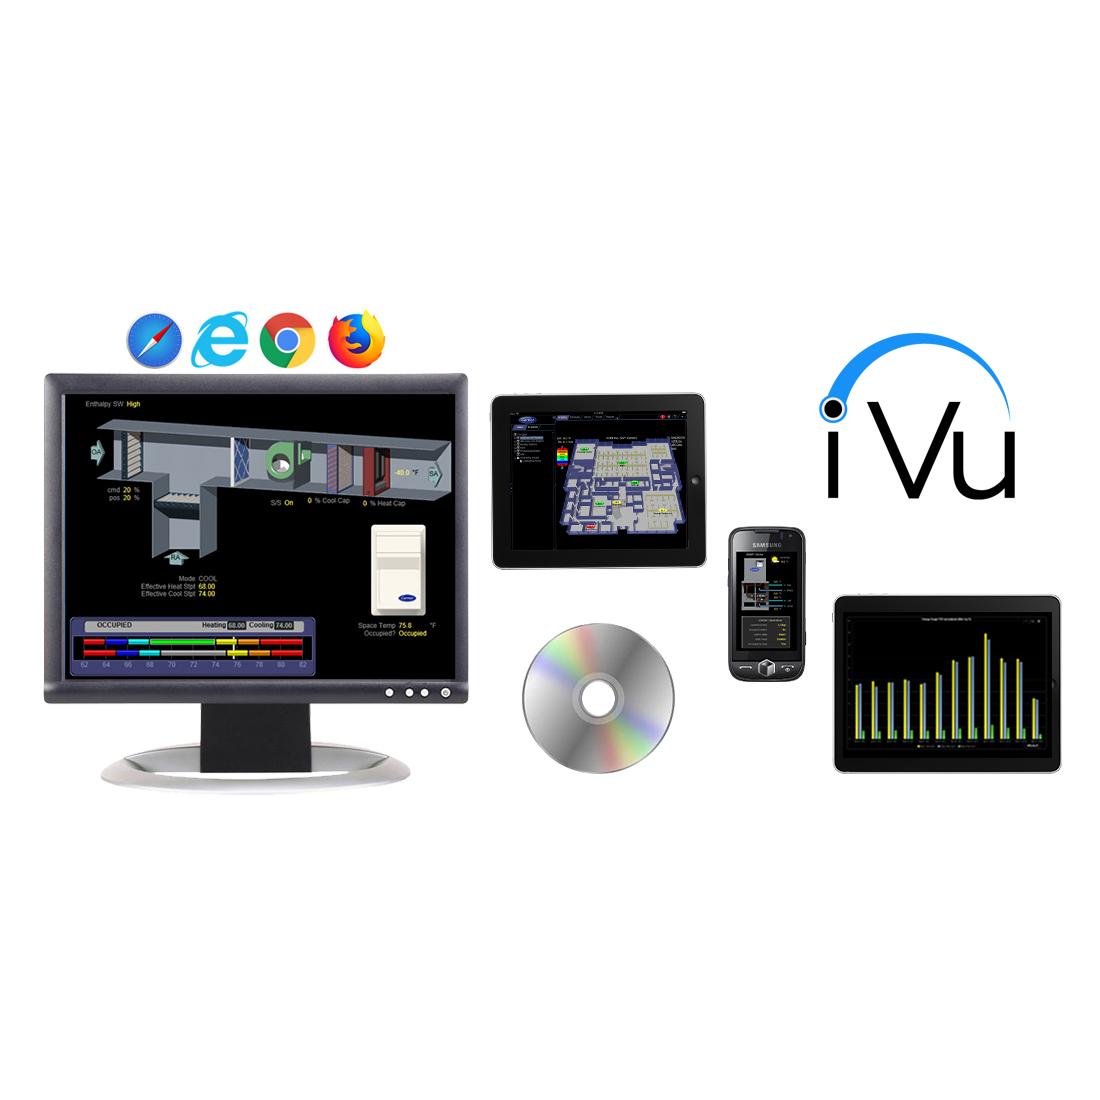 carrier-CIV-OPNPR-i-vu-web-based-operator-interface-new-logo